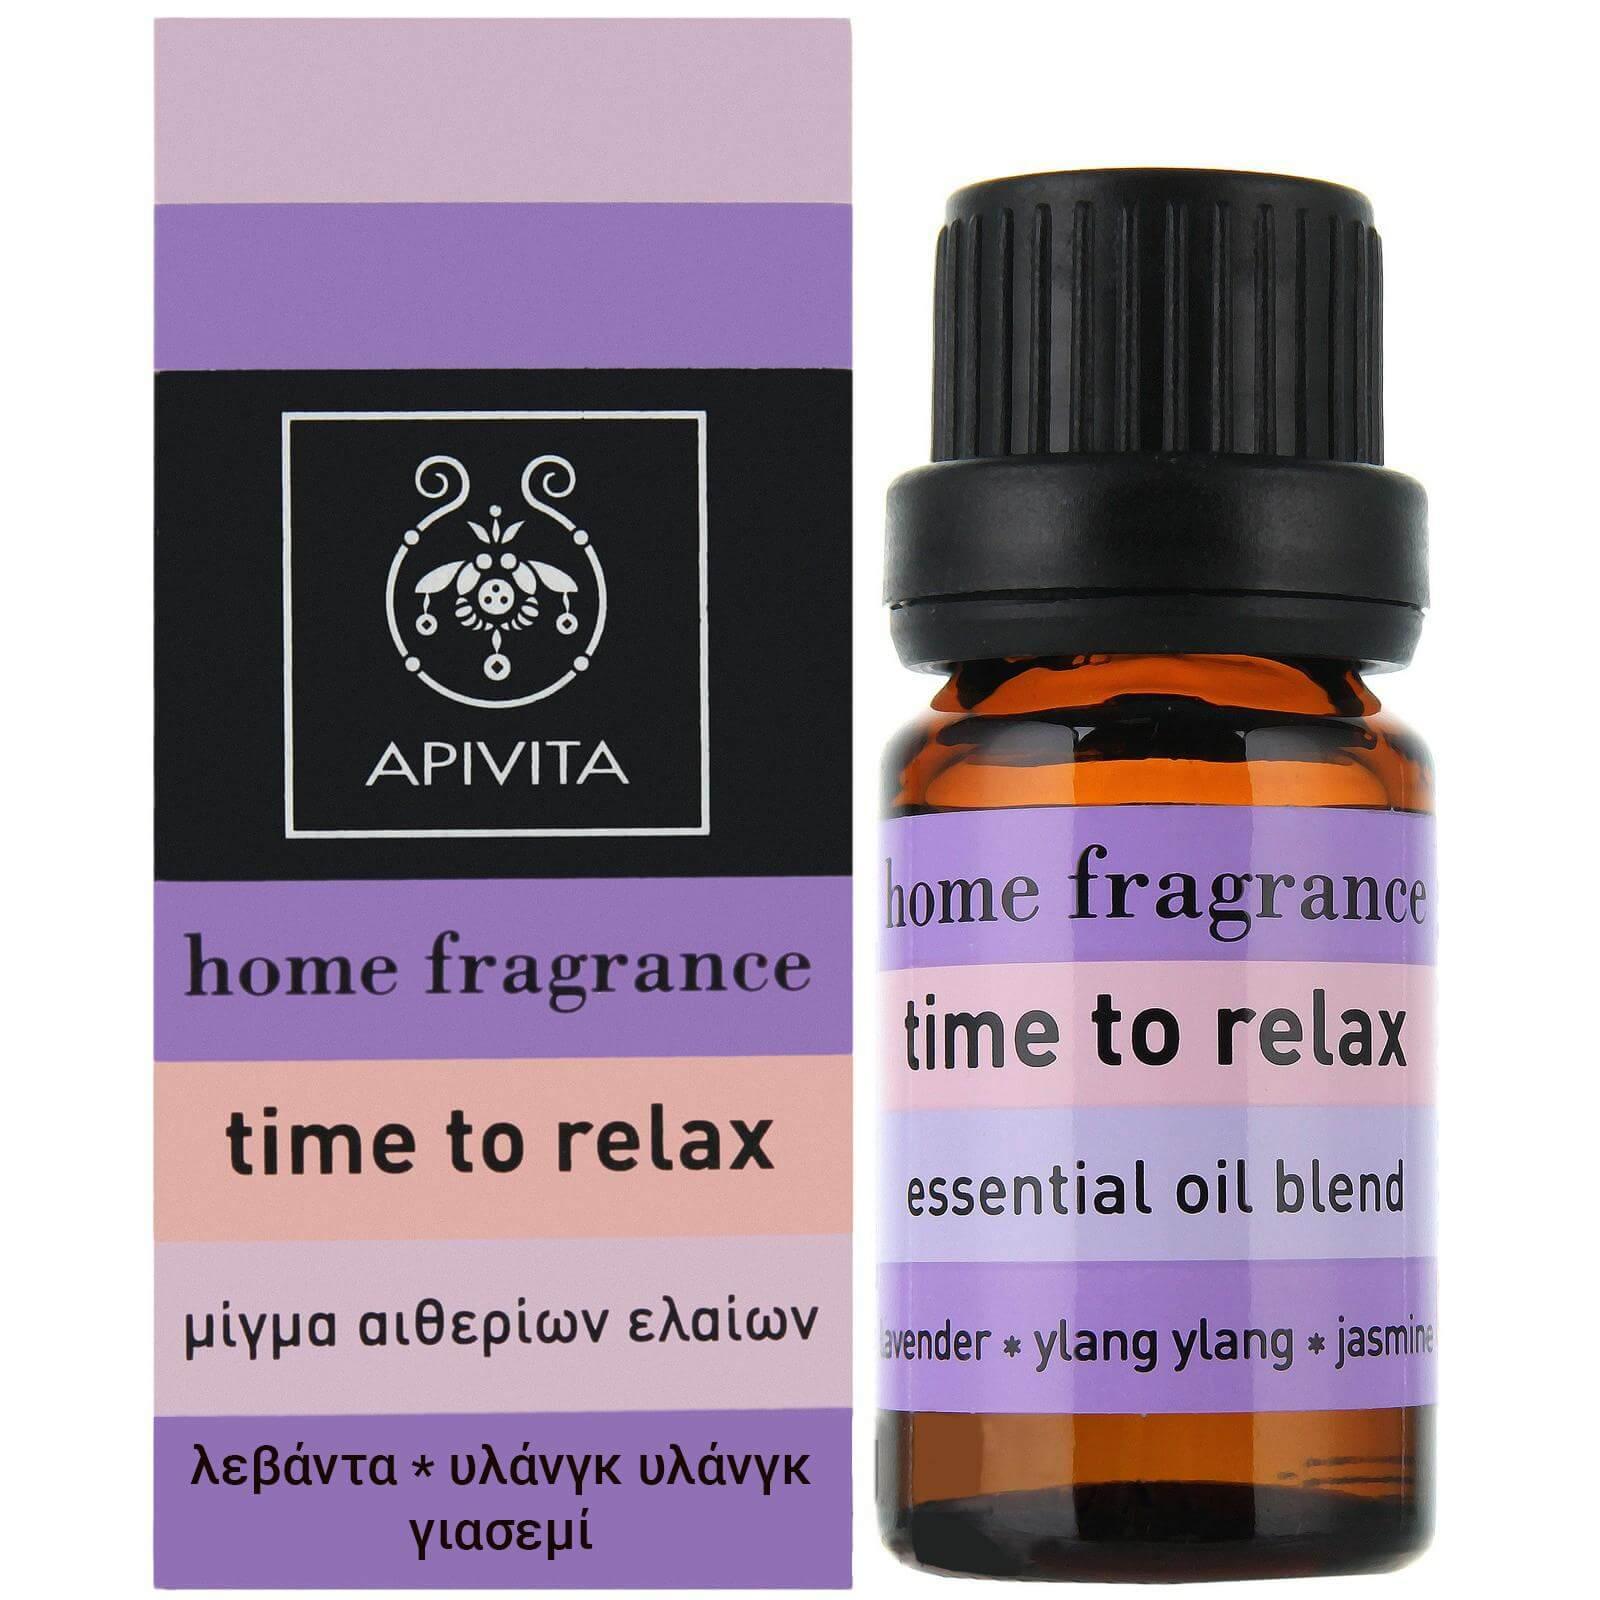 Apivita Essential Oil Time To Relax Λεβάντα, Γιασεμί, Υλάνγκ-Υλάνγκ 10ml